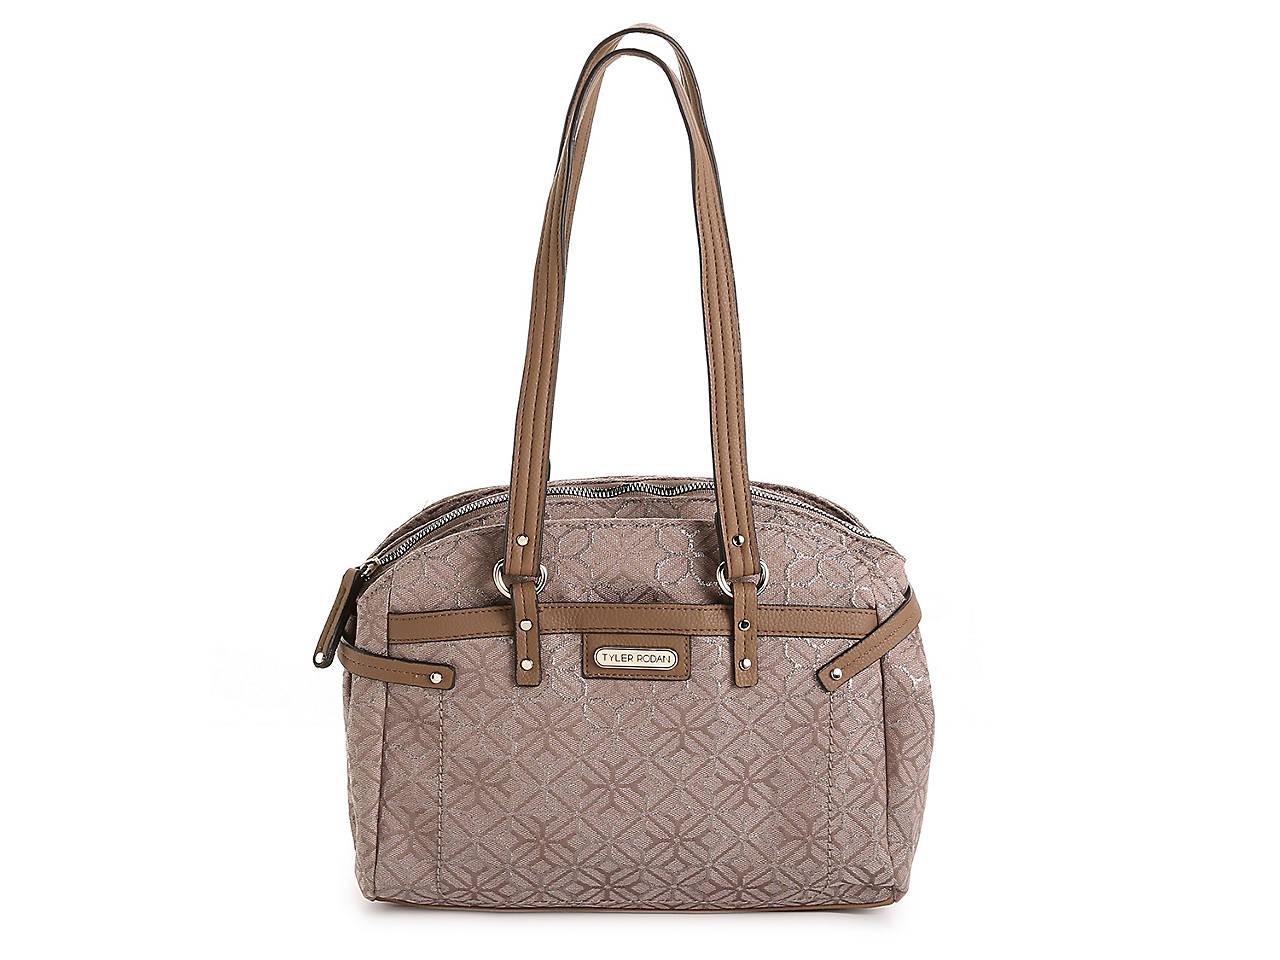 Tyler Rodan Mara Shoulder Bag Womens Handbags Accessories Dsw